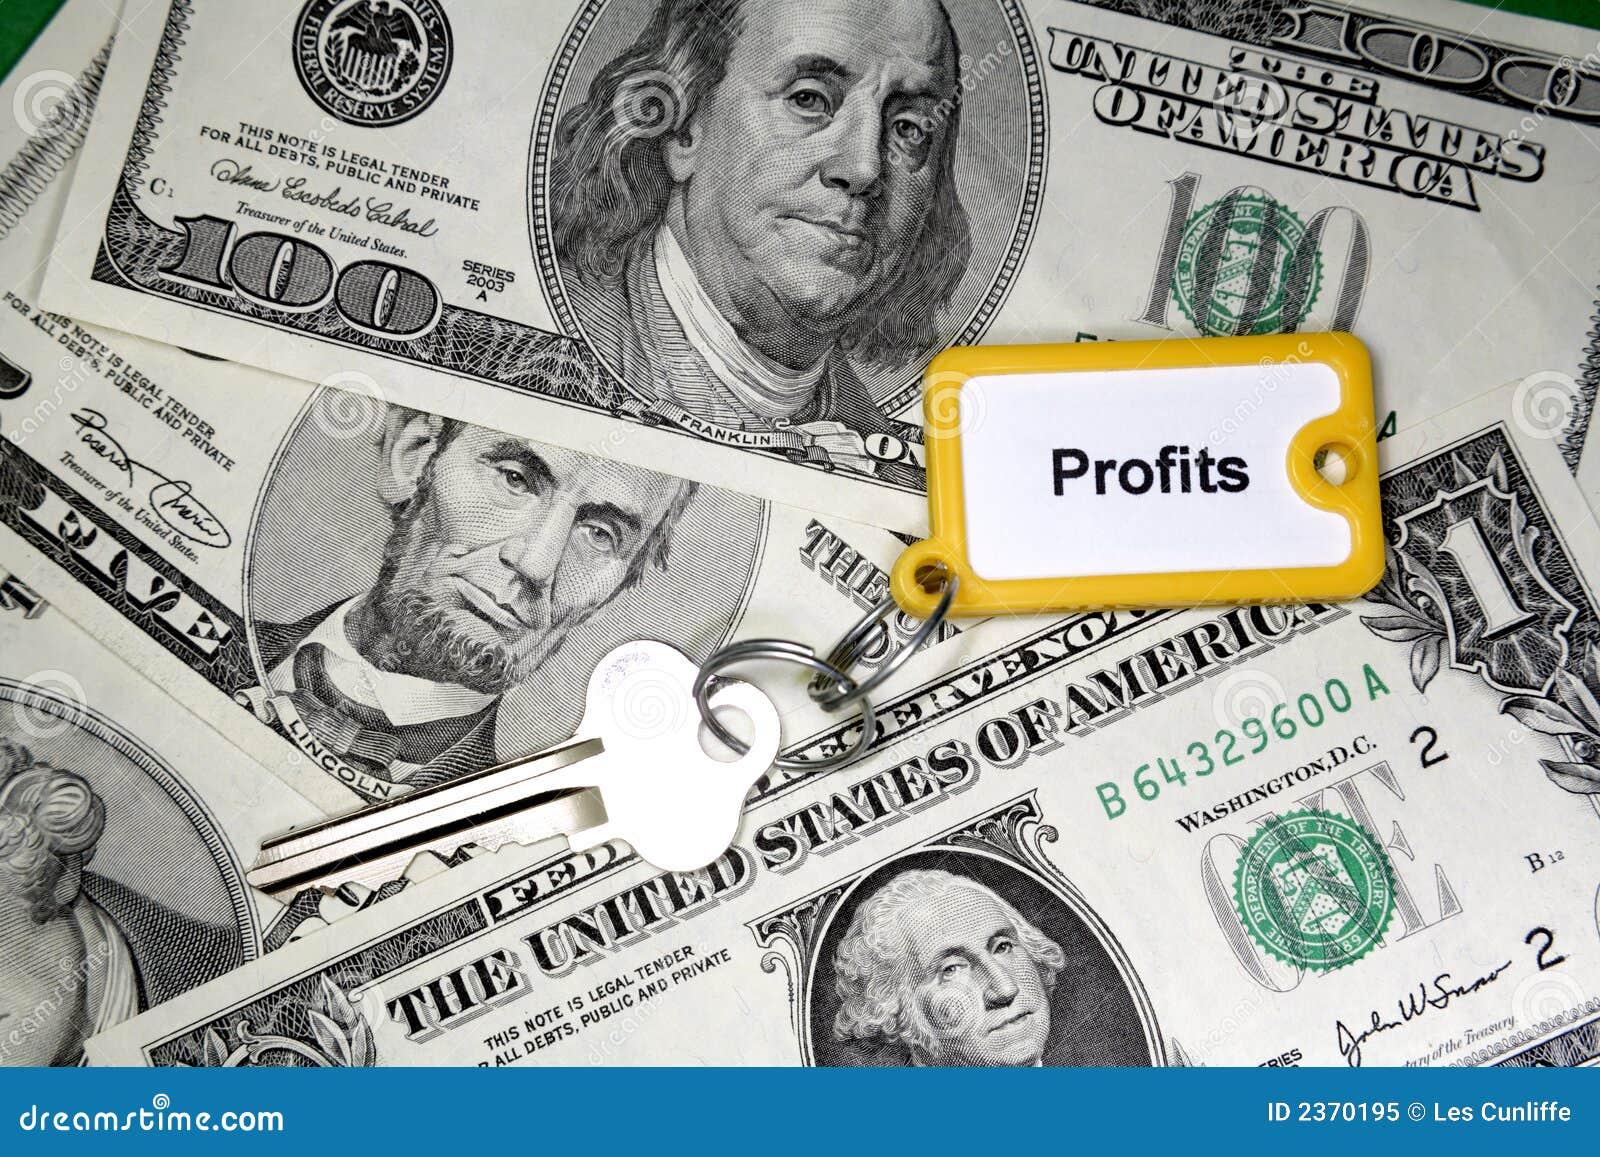 Key to profits